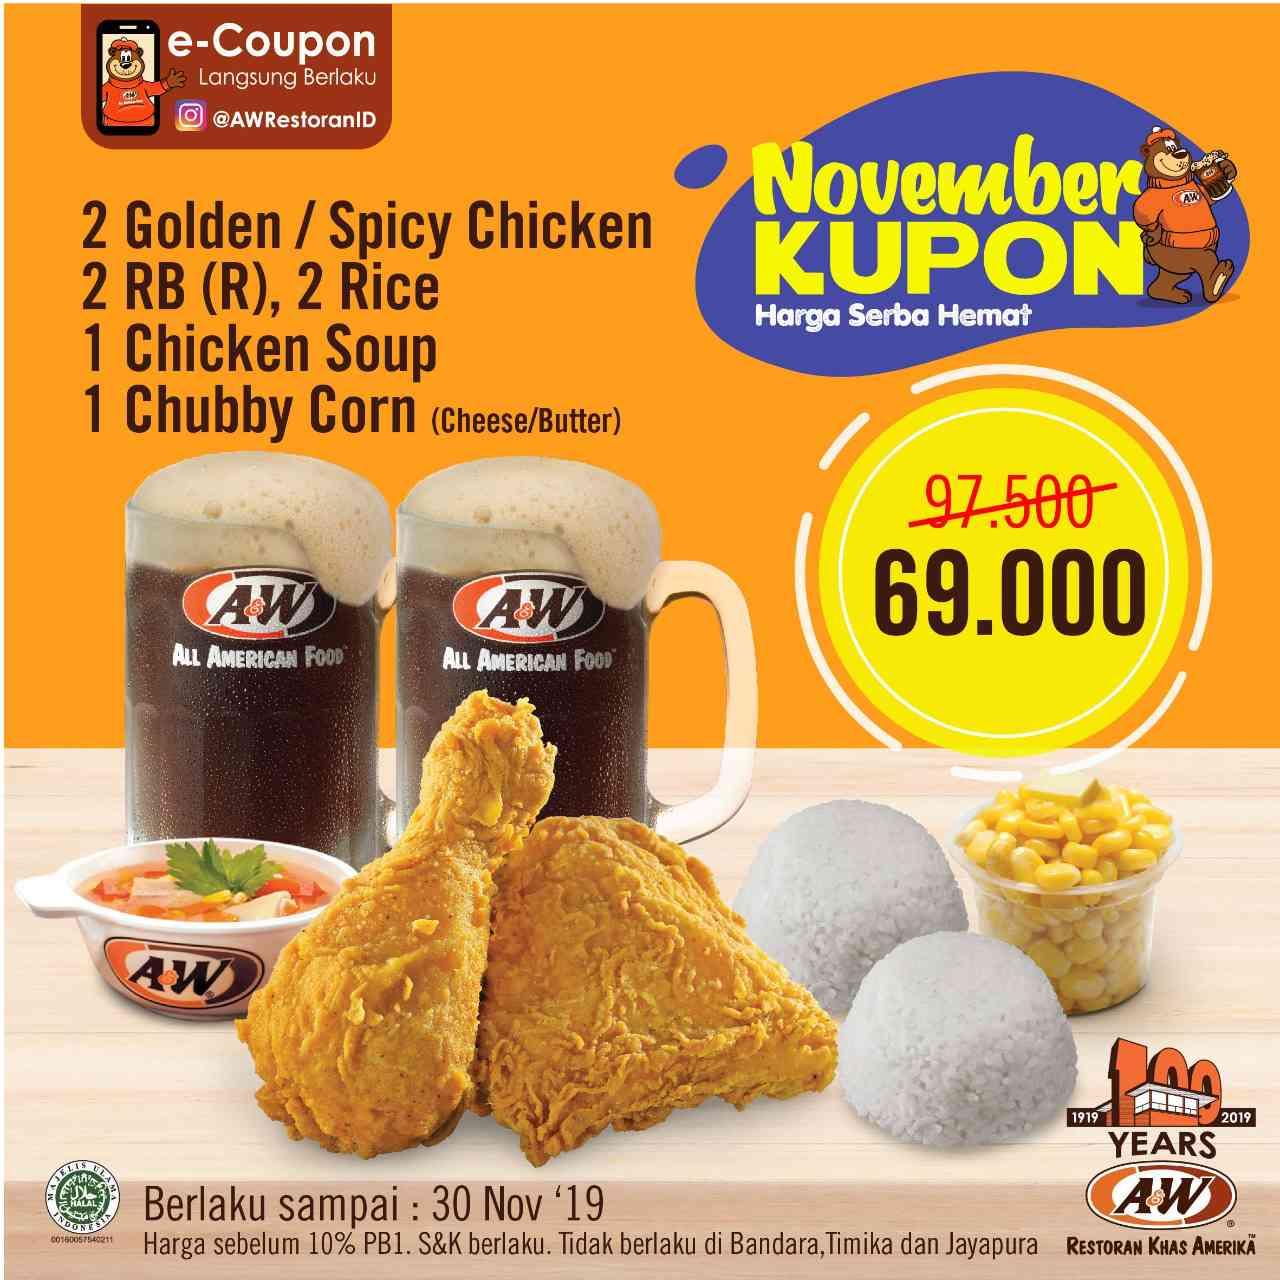 Promo diskon A&W Promo Kupon November Hemat